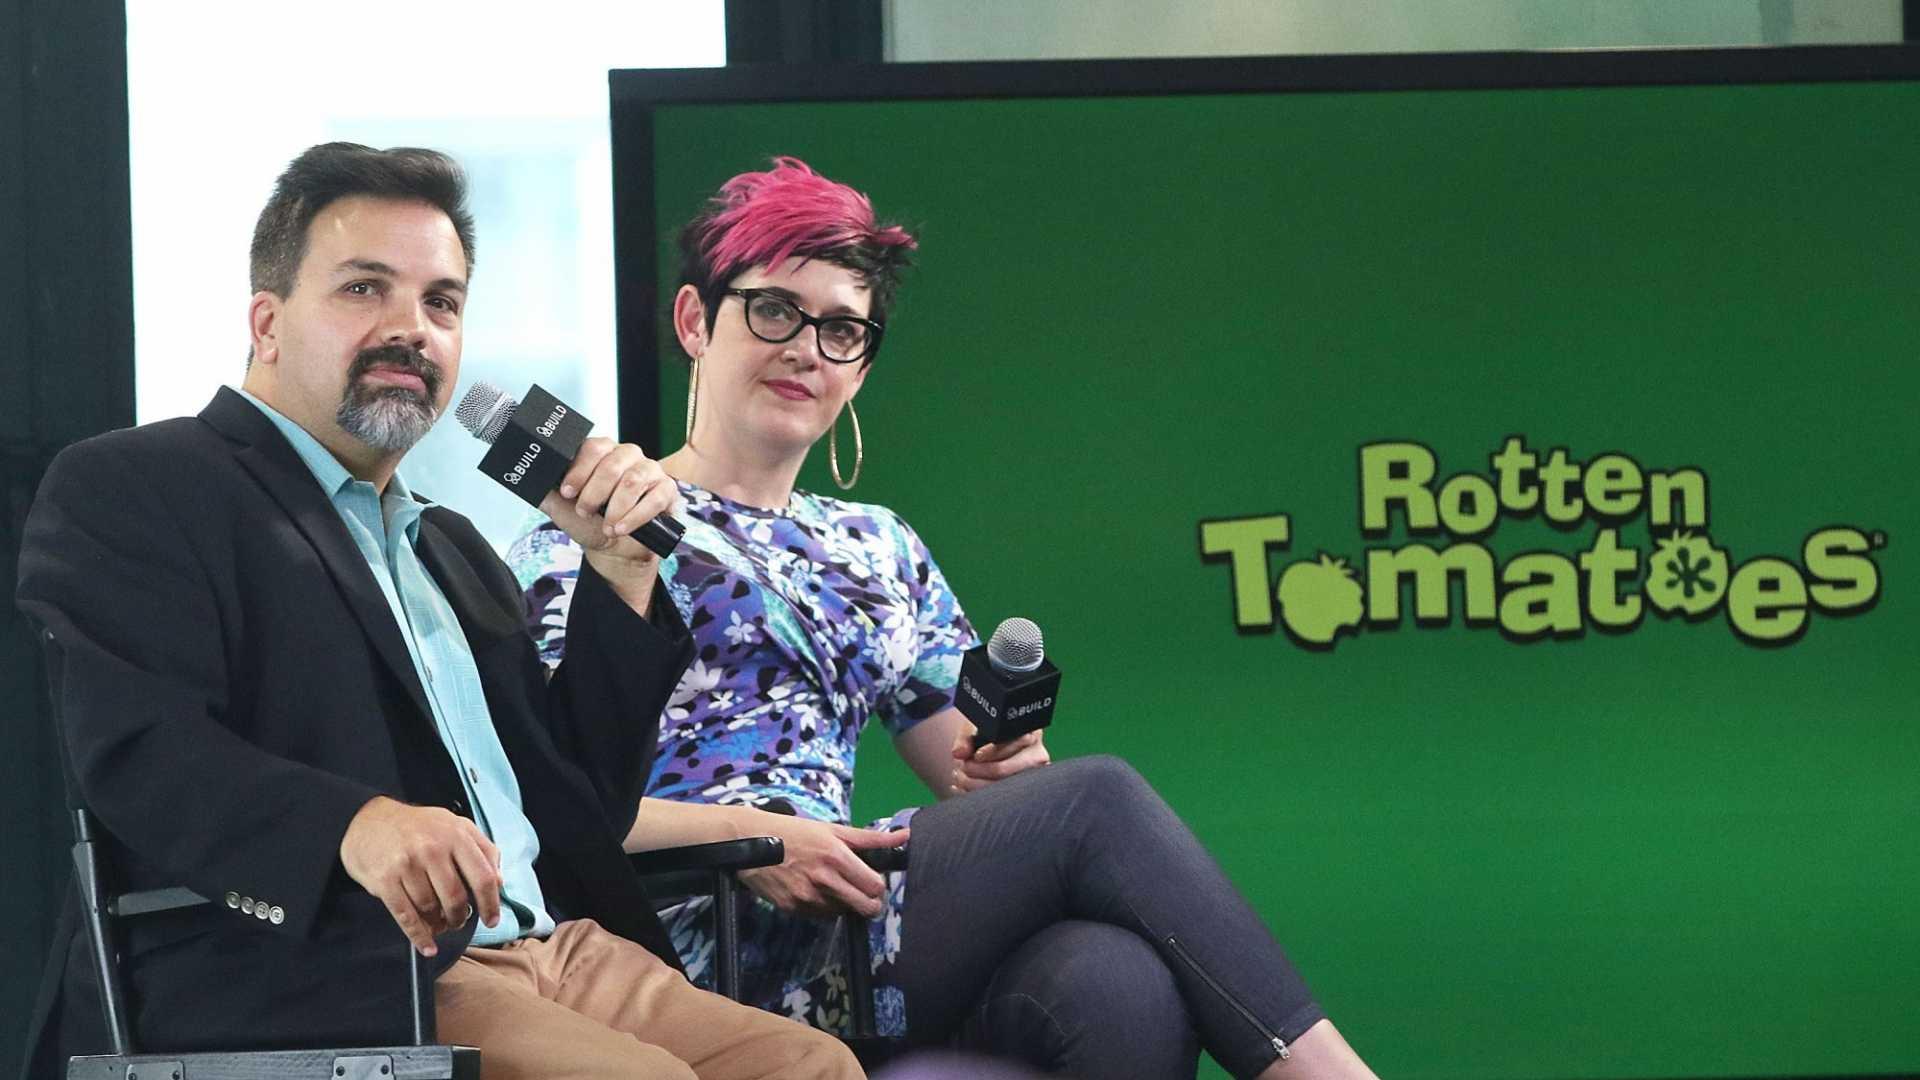 Rotten Tomatoes' former Editor-in-Chief Matt Atchity & current Senior Editor Grae Drake.